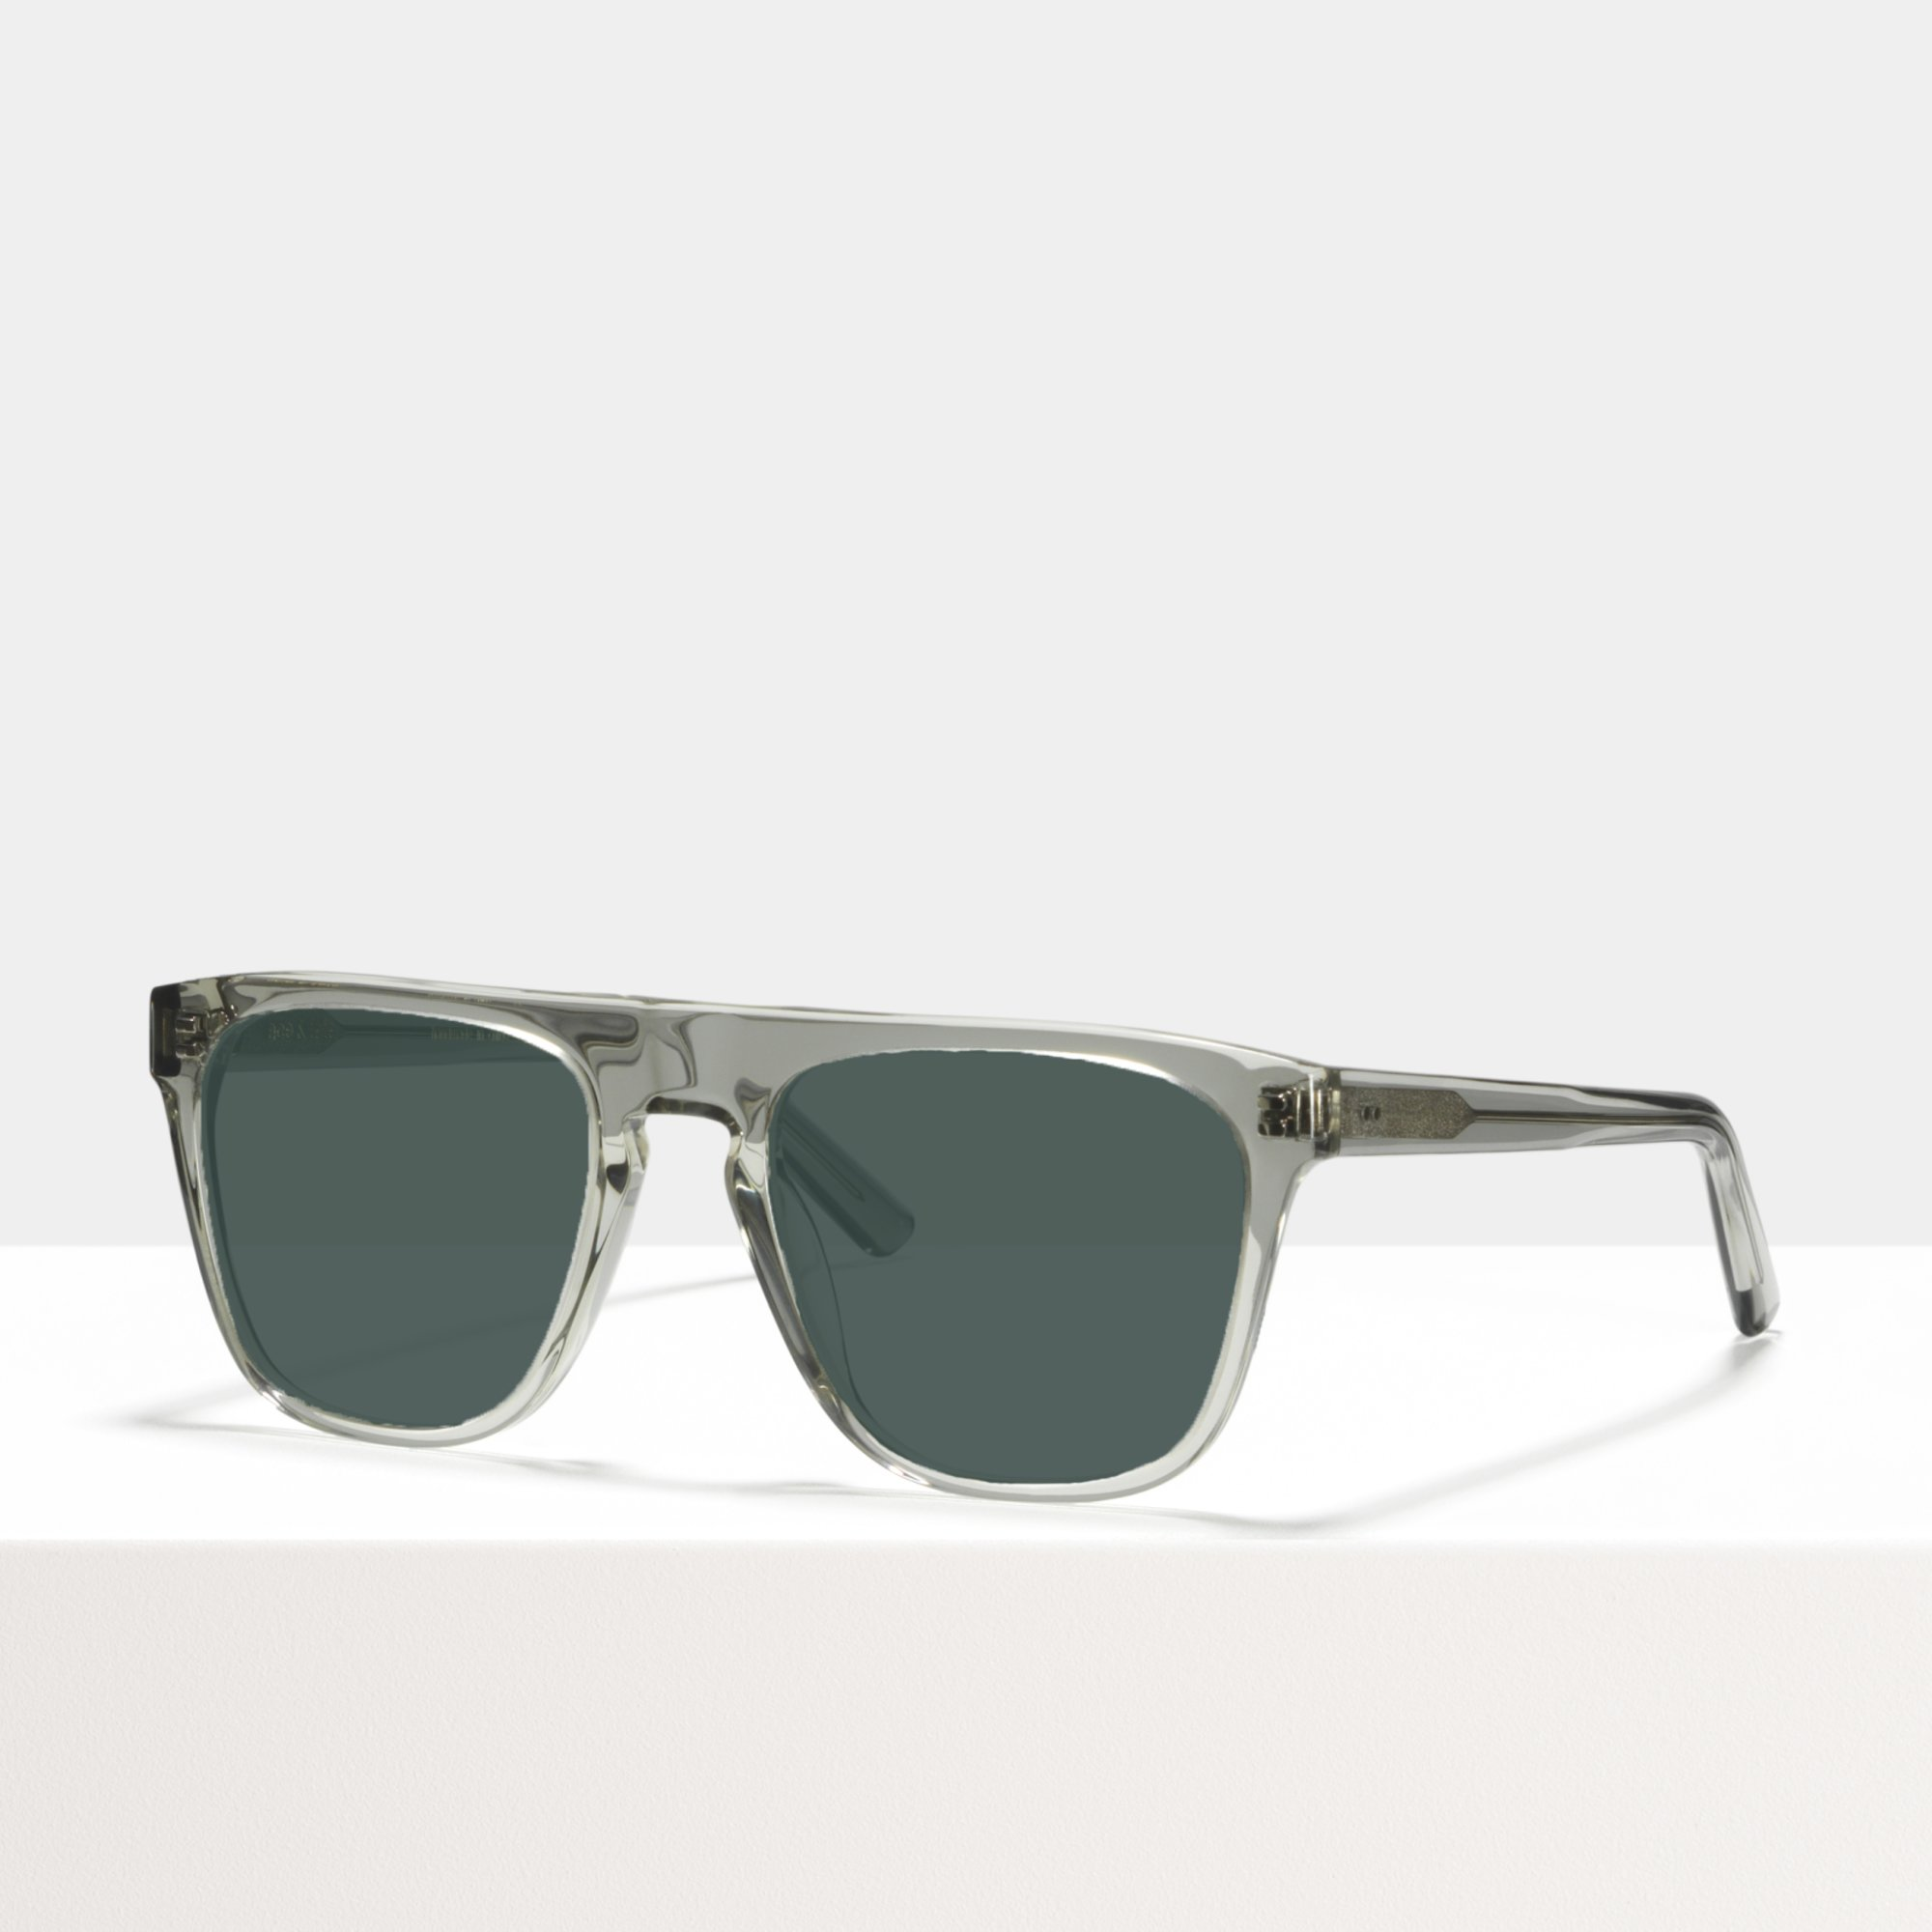 Ace & Tate Sunglasses   square acetate in Clear, Grey